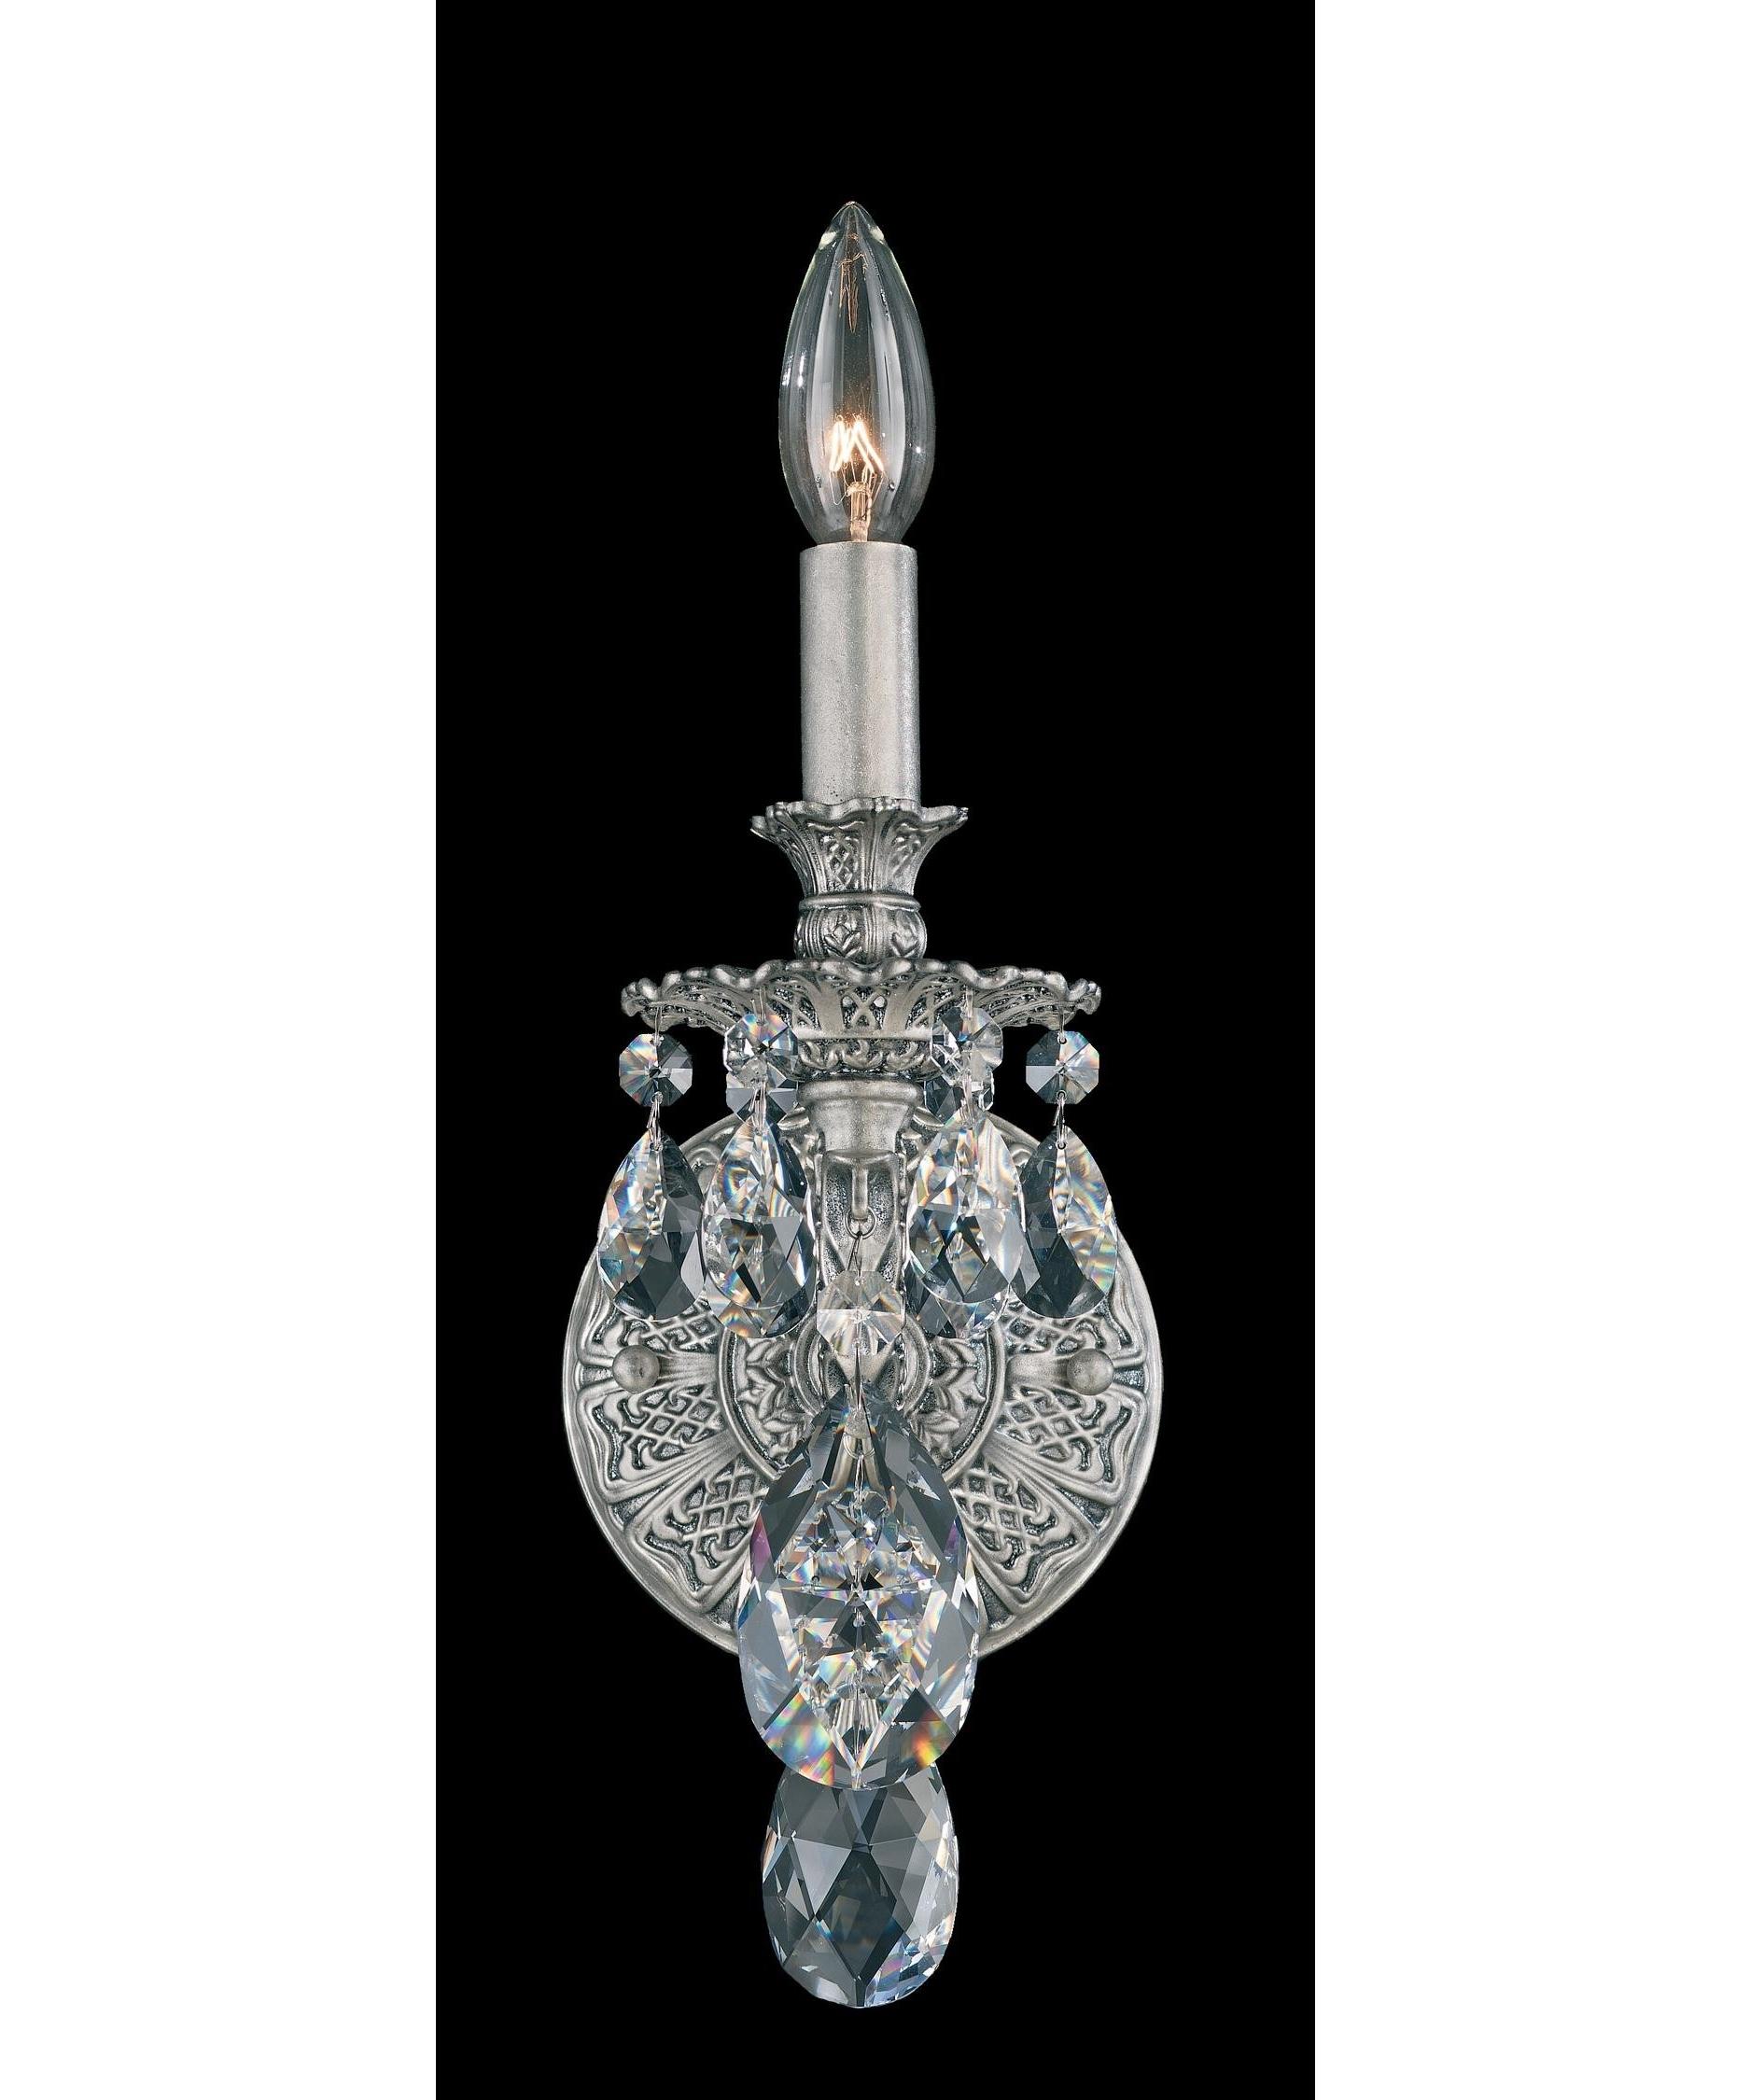 Lighting 131 Glass Sconce Lightings Chandelier Candle Holder Sale Inside Latest Bathroom Chandelier Wall Lights (View 9 of 15)